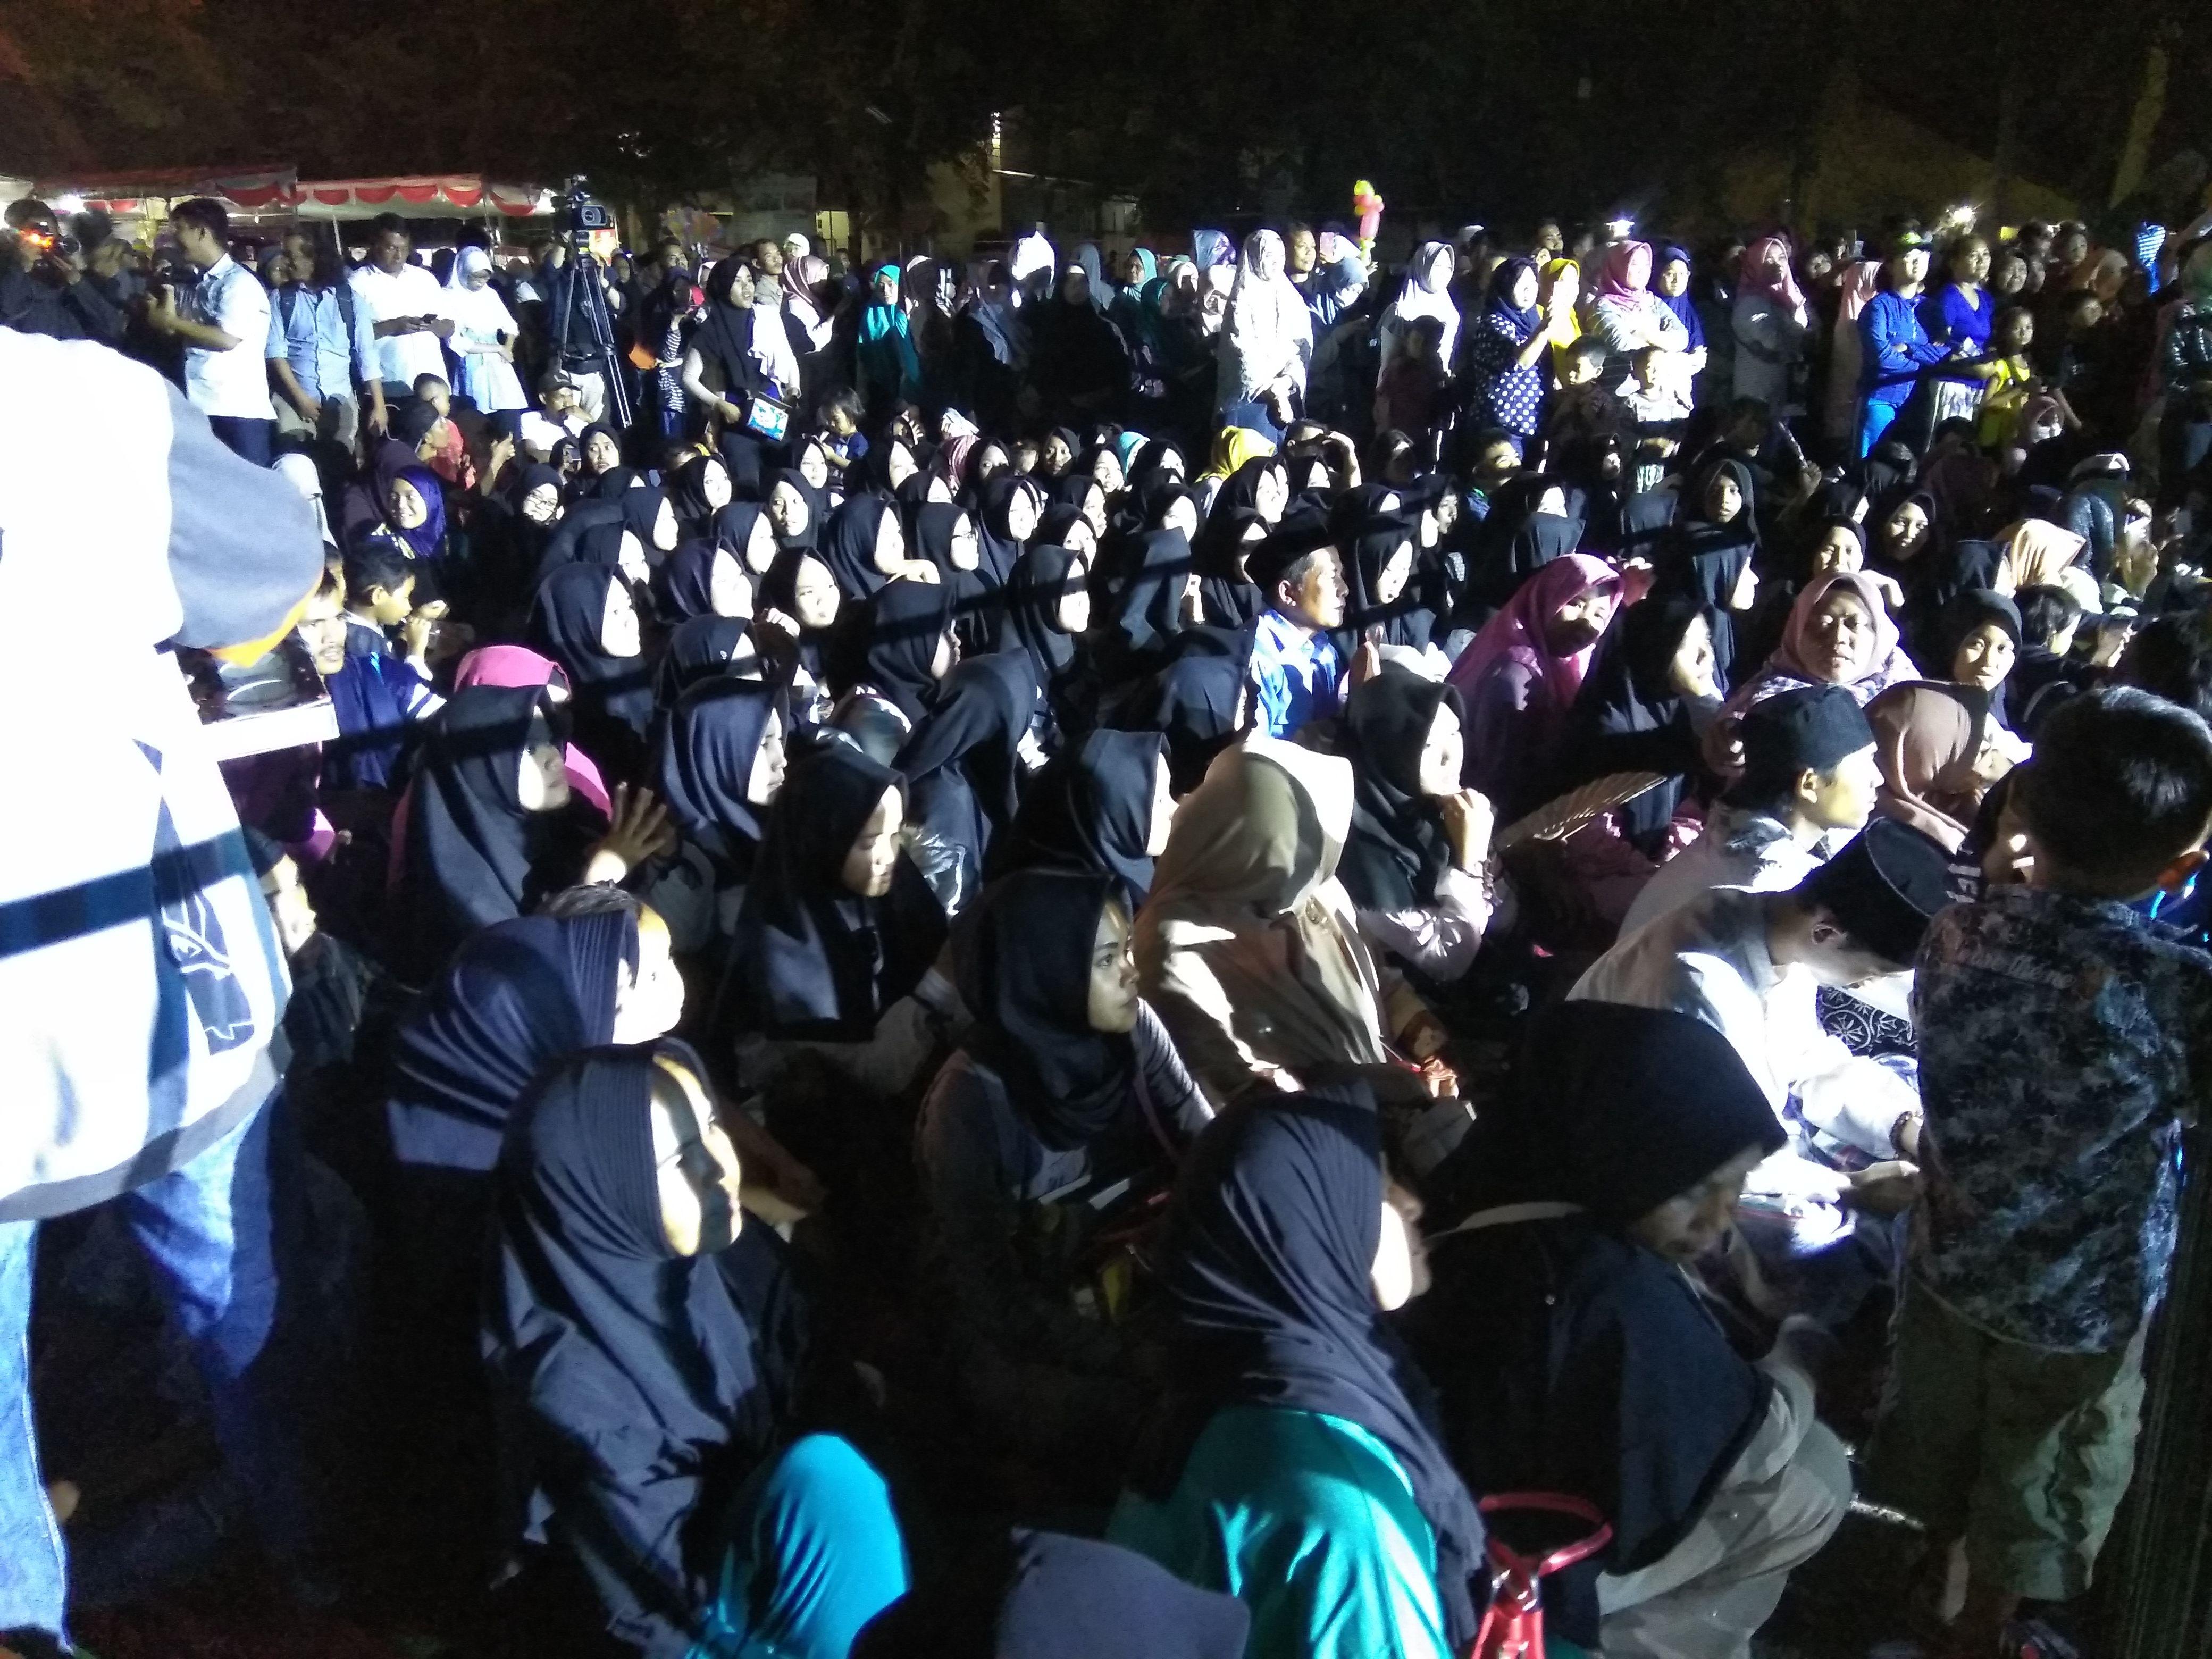 Santri dan warga Serang memadati Halaman Stadion Maulana Yusuf, Ciceri, Serang, Banten, Sabtu (23/3/2019)